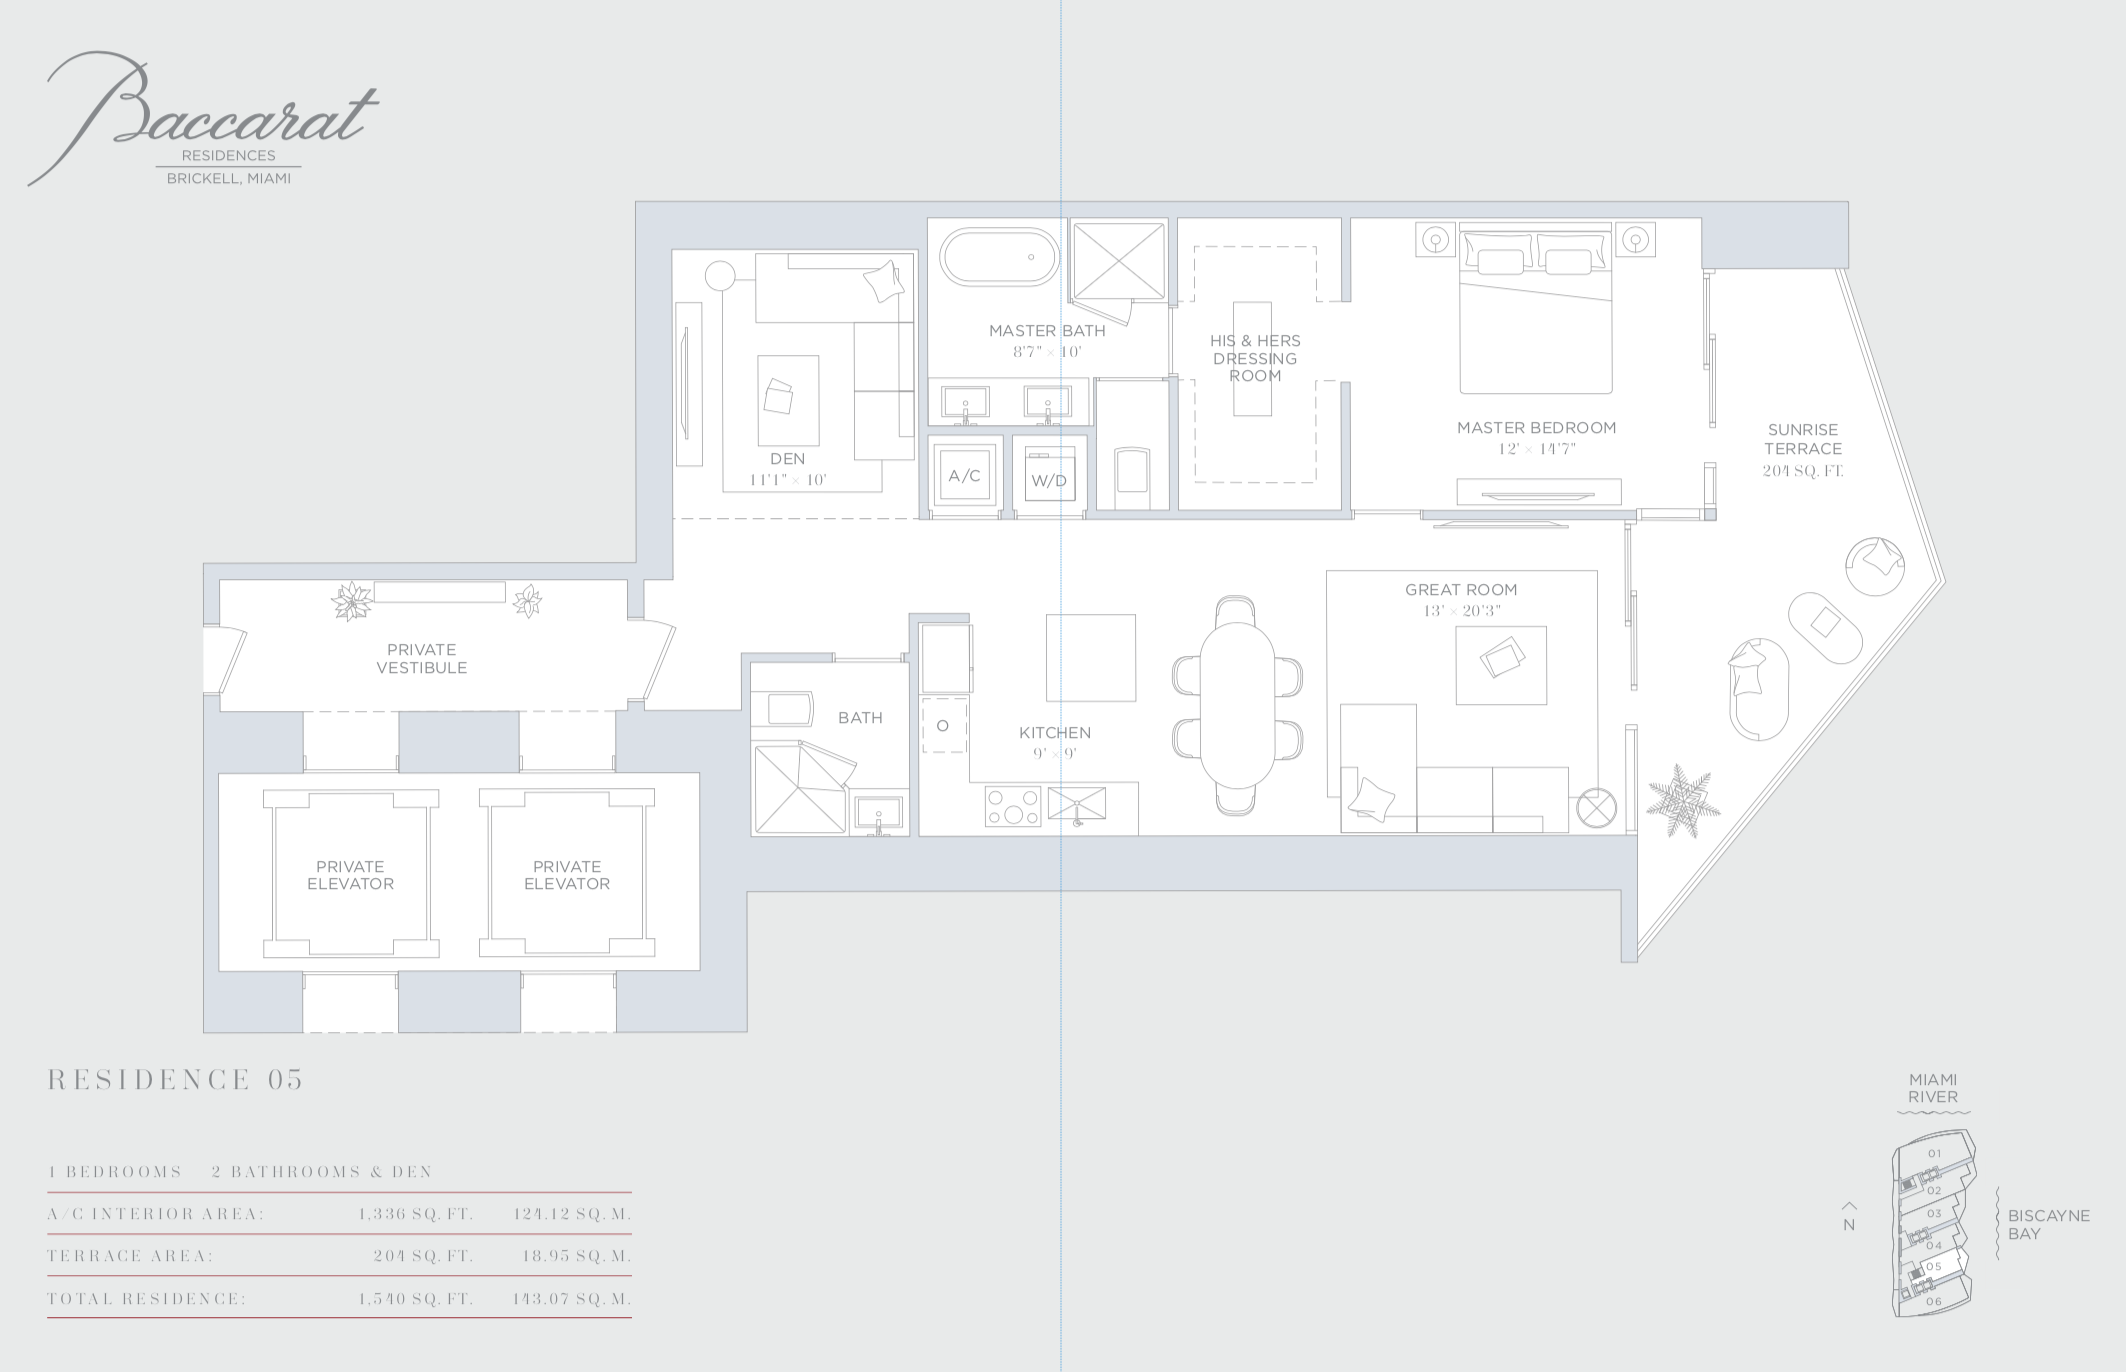 Baccarat | Residence 05 | 1 Bedroom + Den | 1,336 SF